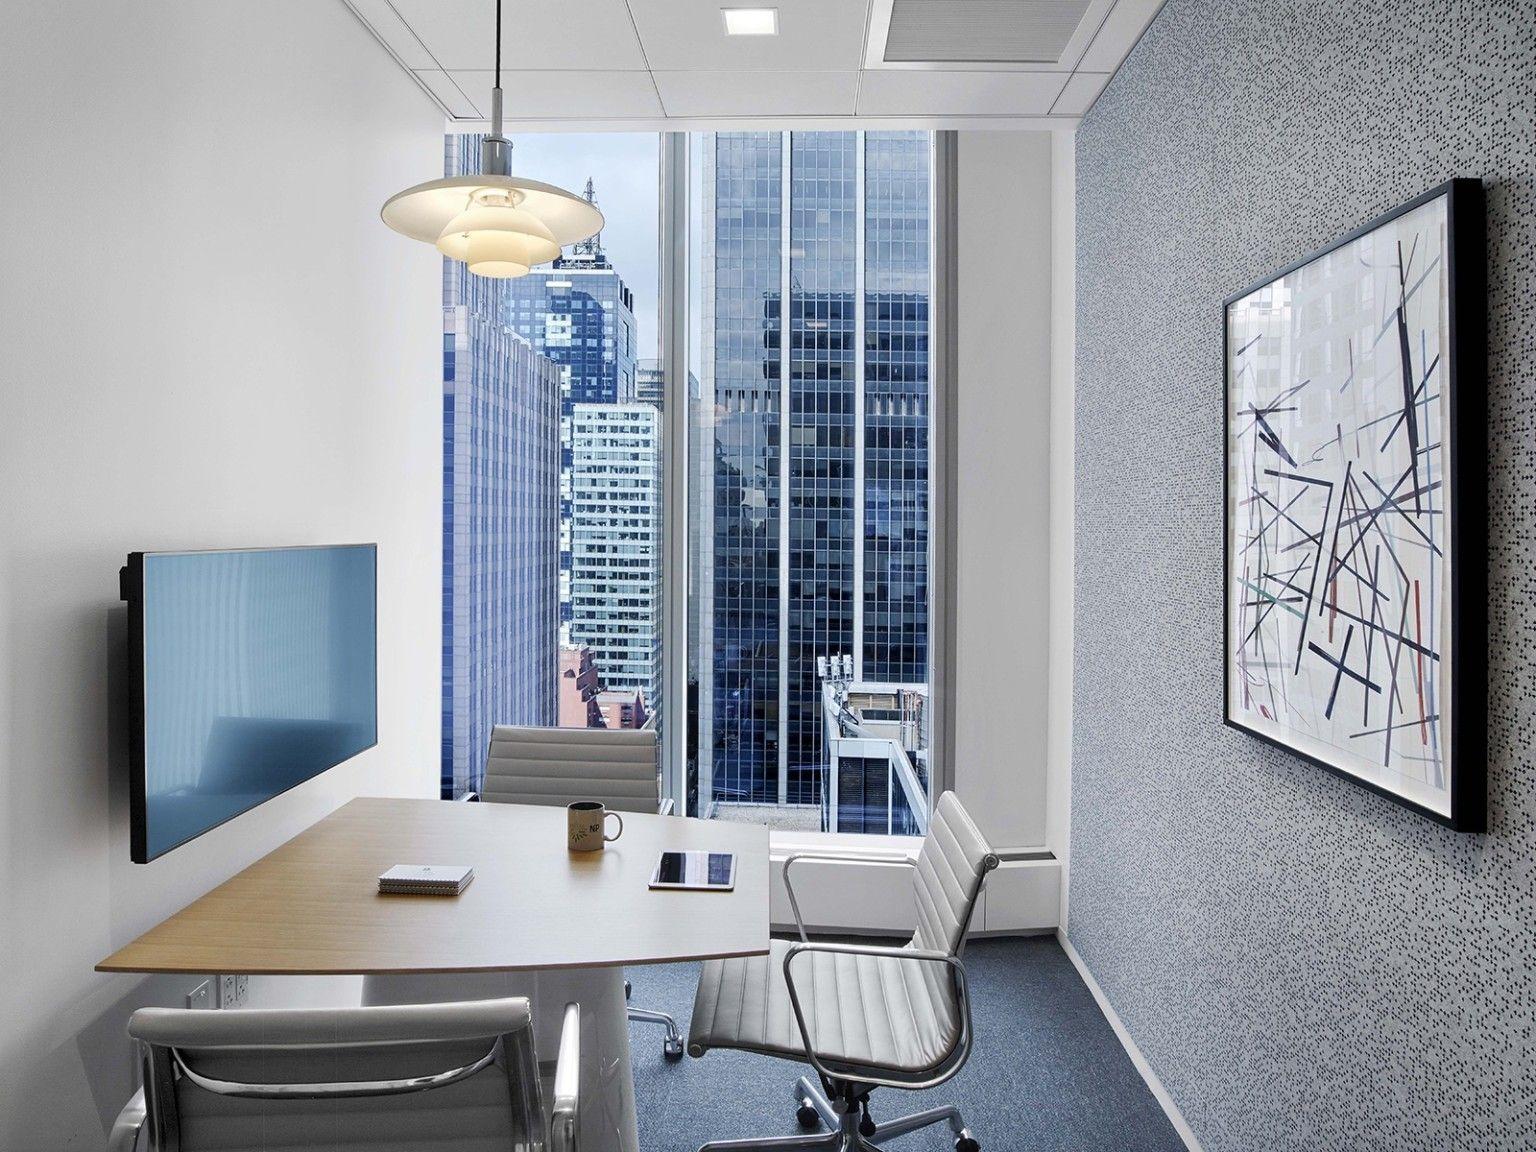 A Tour of Nixon Peabody's Elegant NYC Office | Interior ...